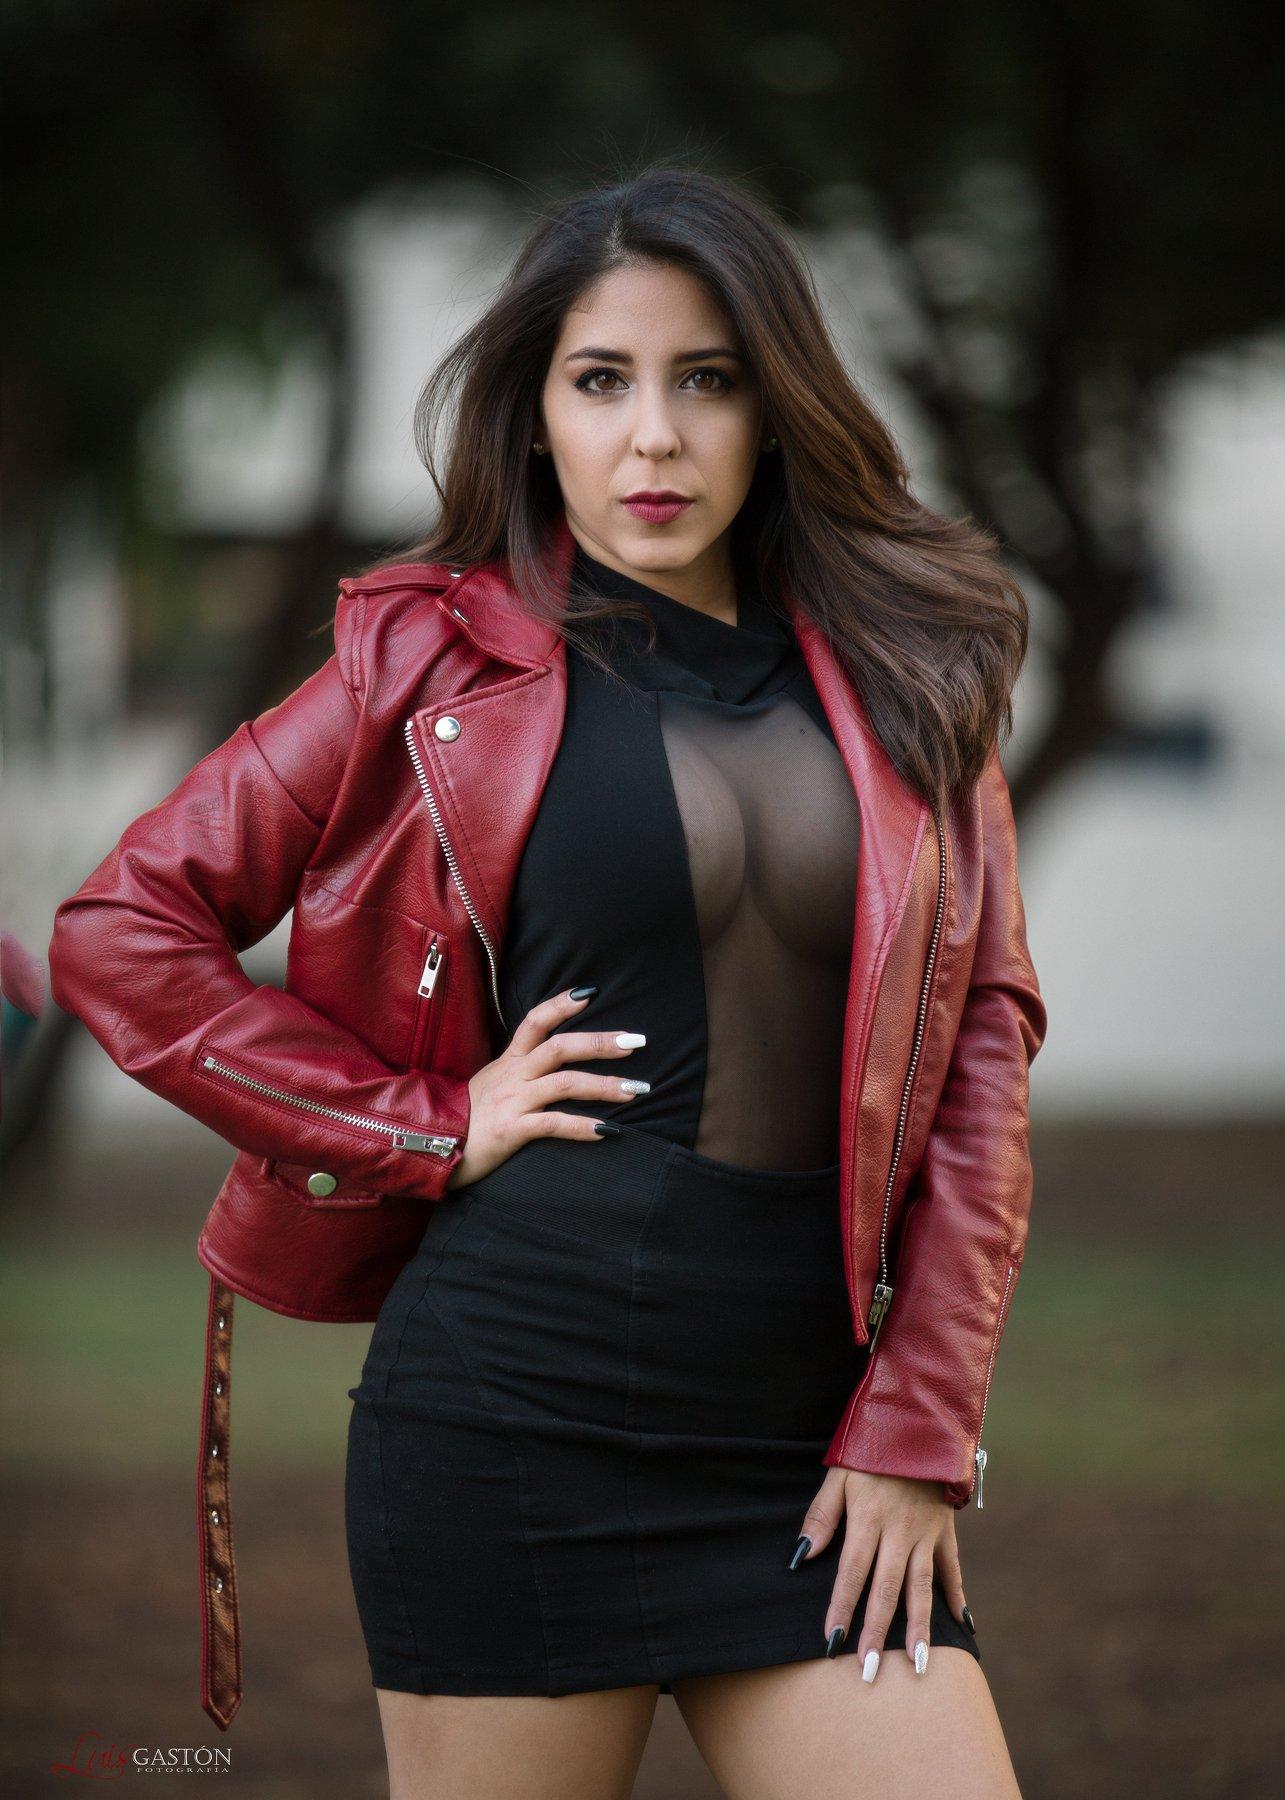 sexy, portrait, cute, beautiful, latin, girl, Luis Gaston